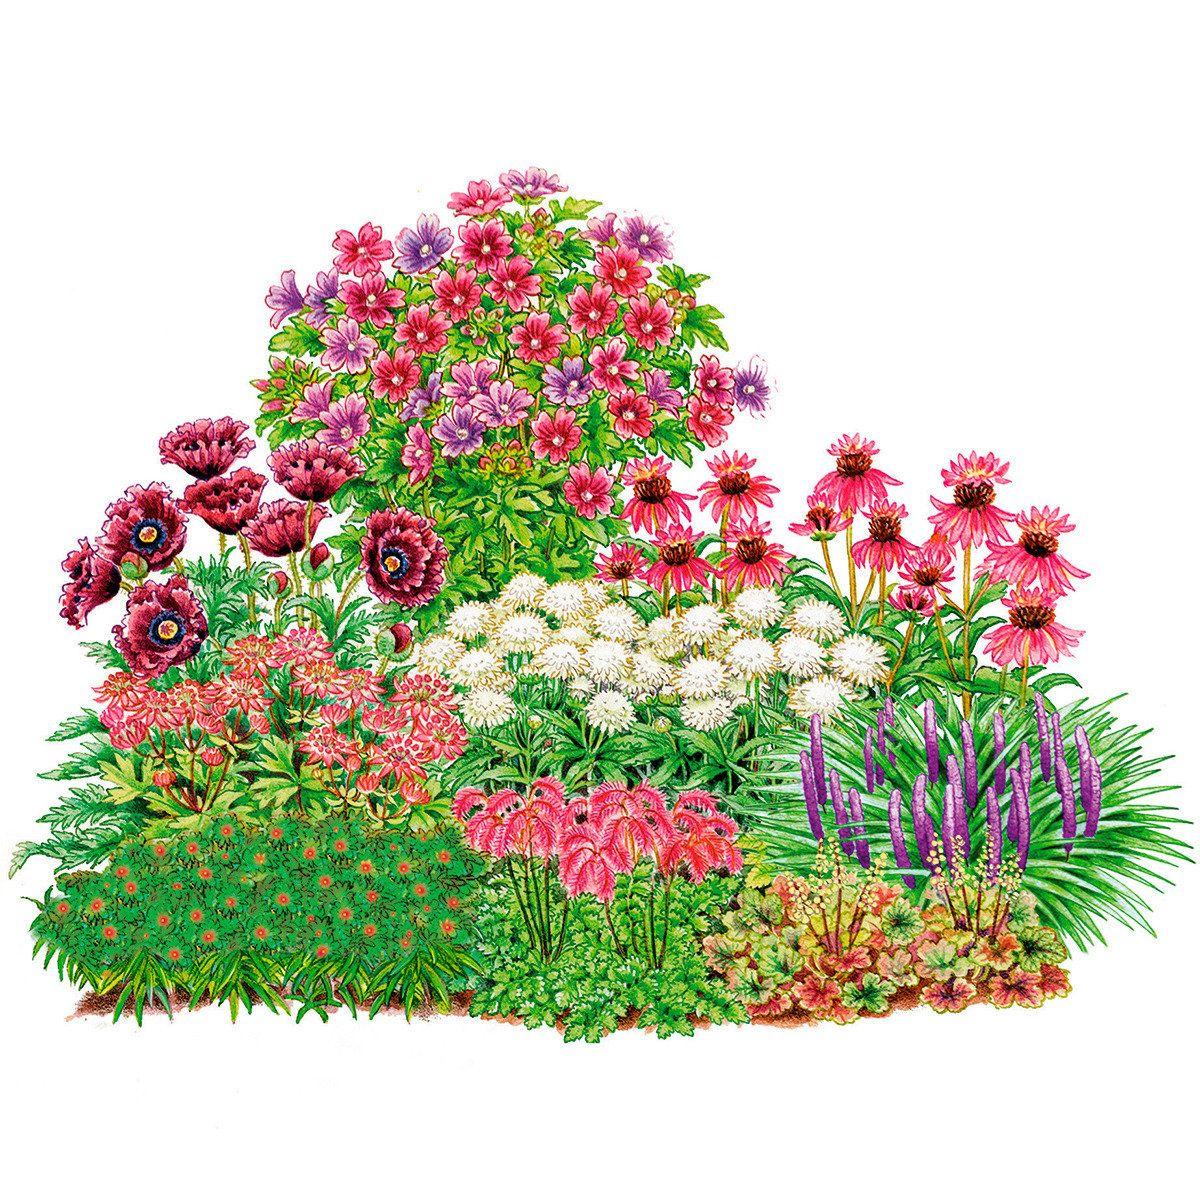 sortiment geheimnisvolle stauden artistic floral amazing pinterest garten gardens and. Black Bedroom Furniture Sets. Home Design Ideas